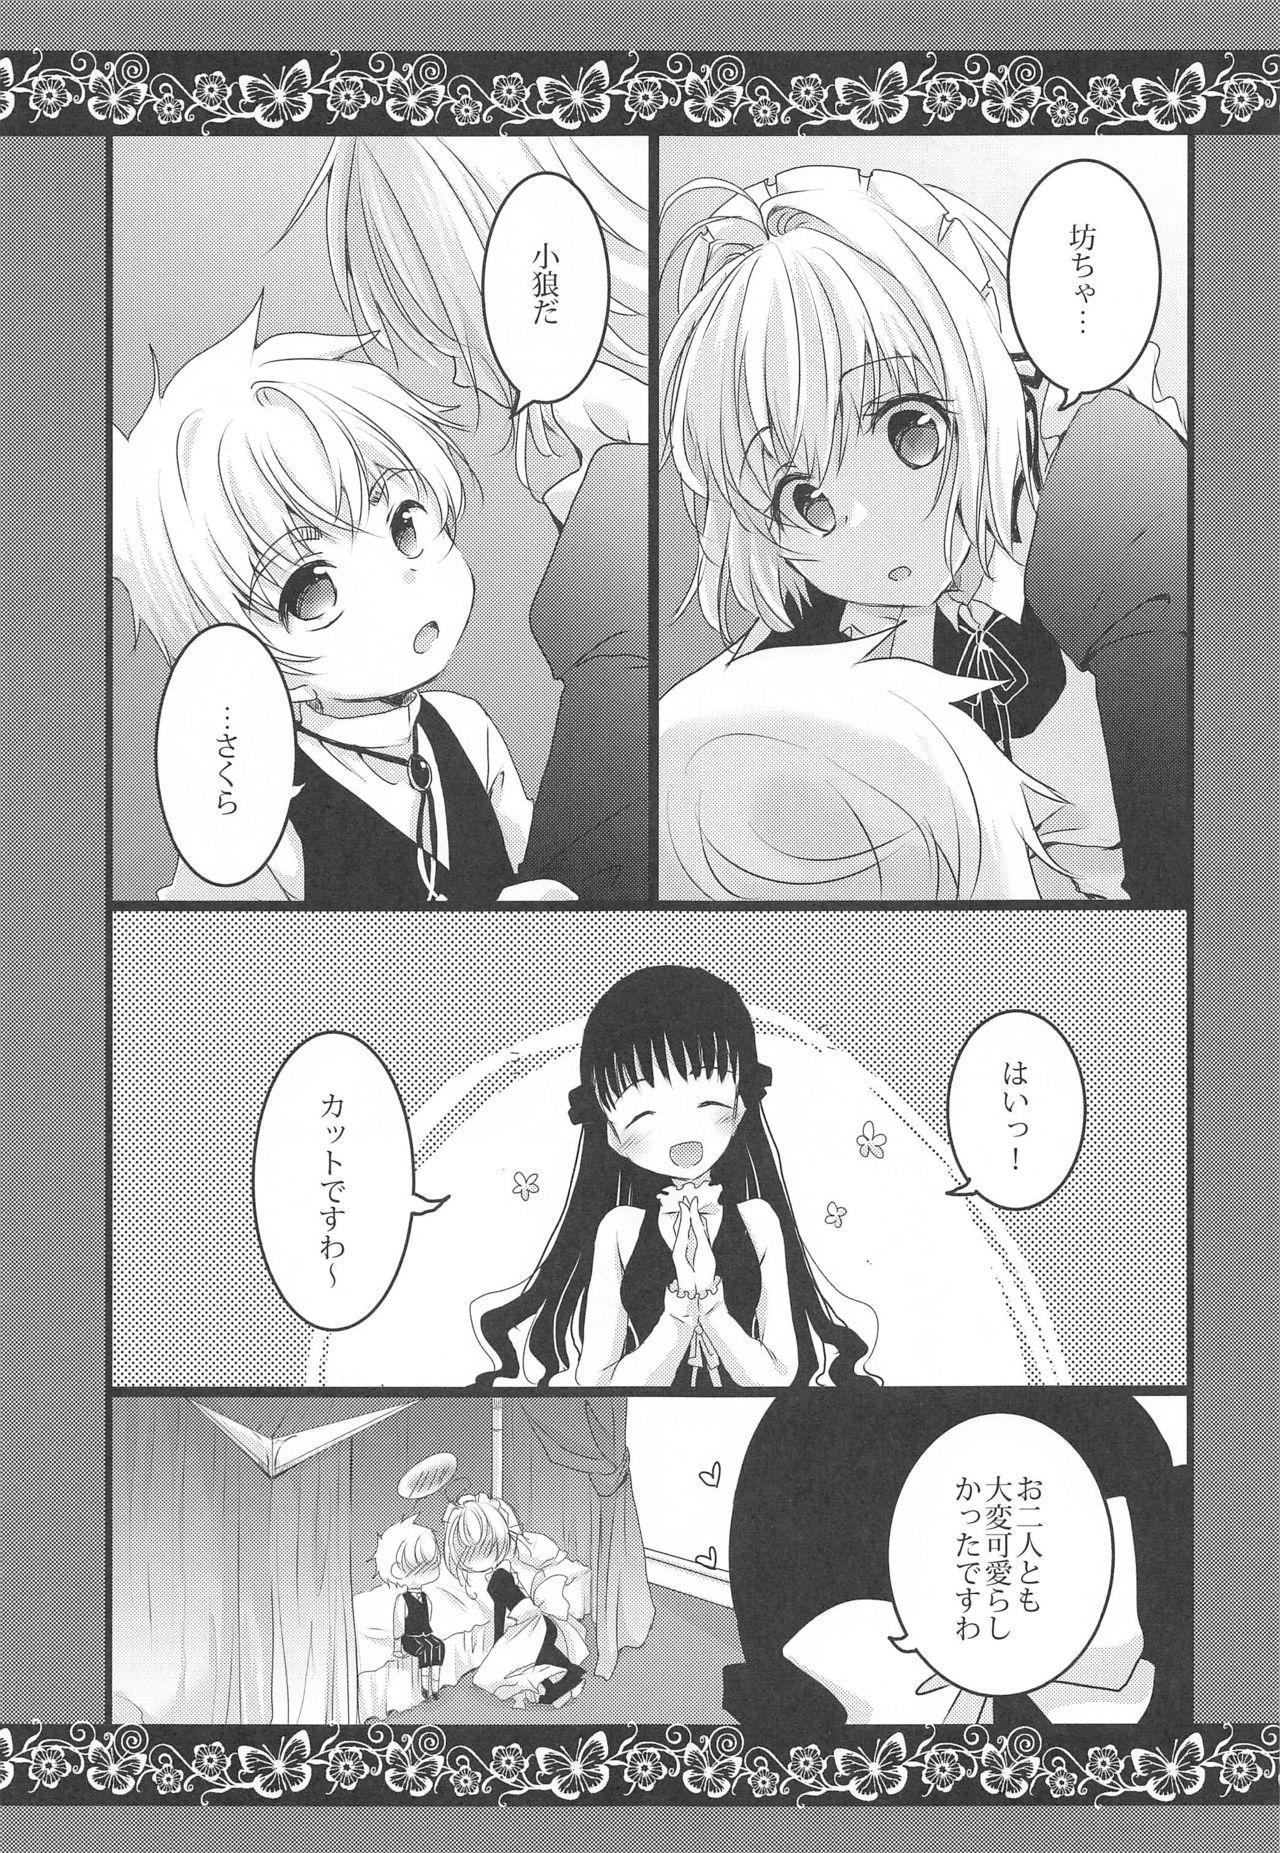 Maid to Goshujin-sama 5